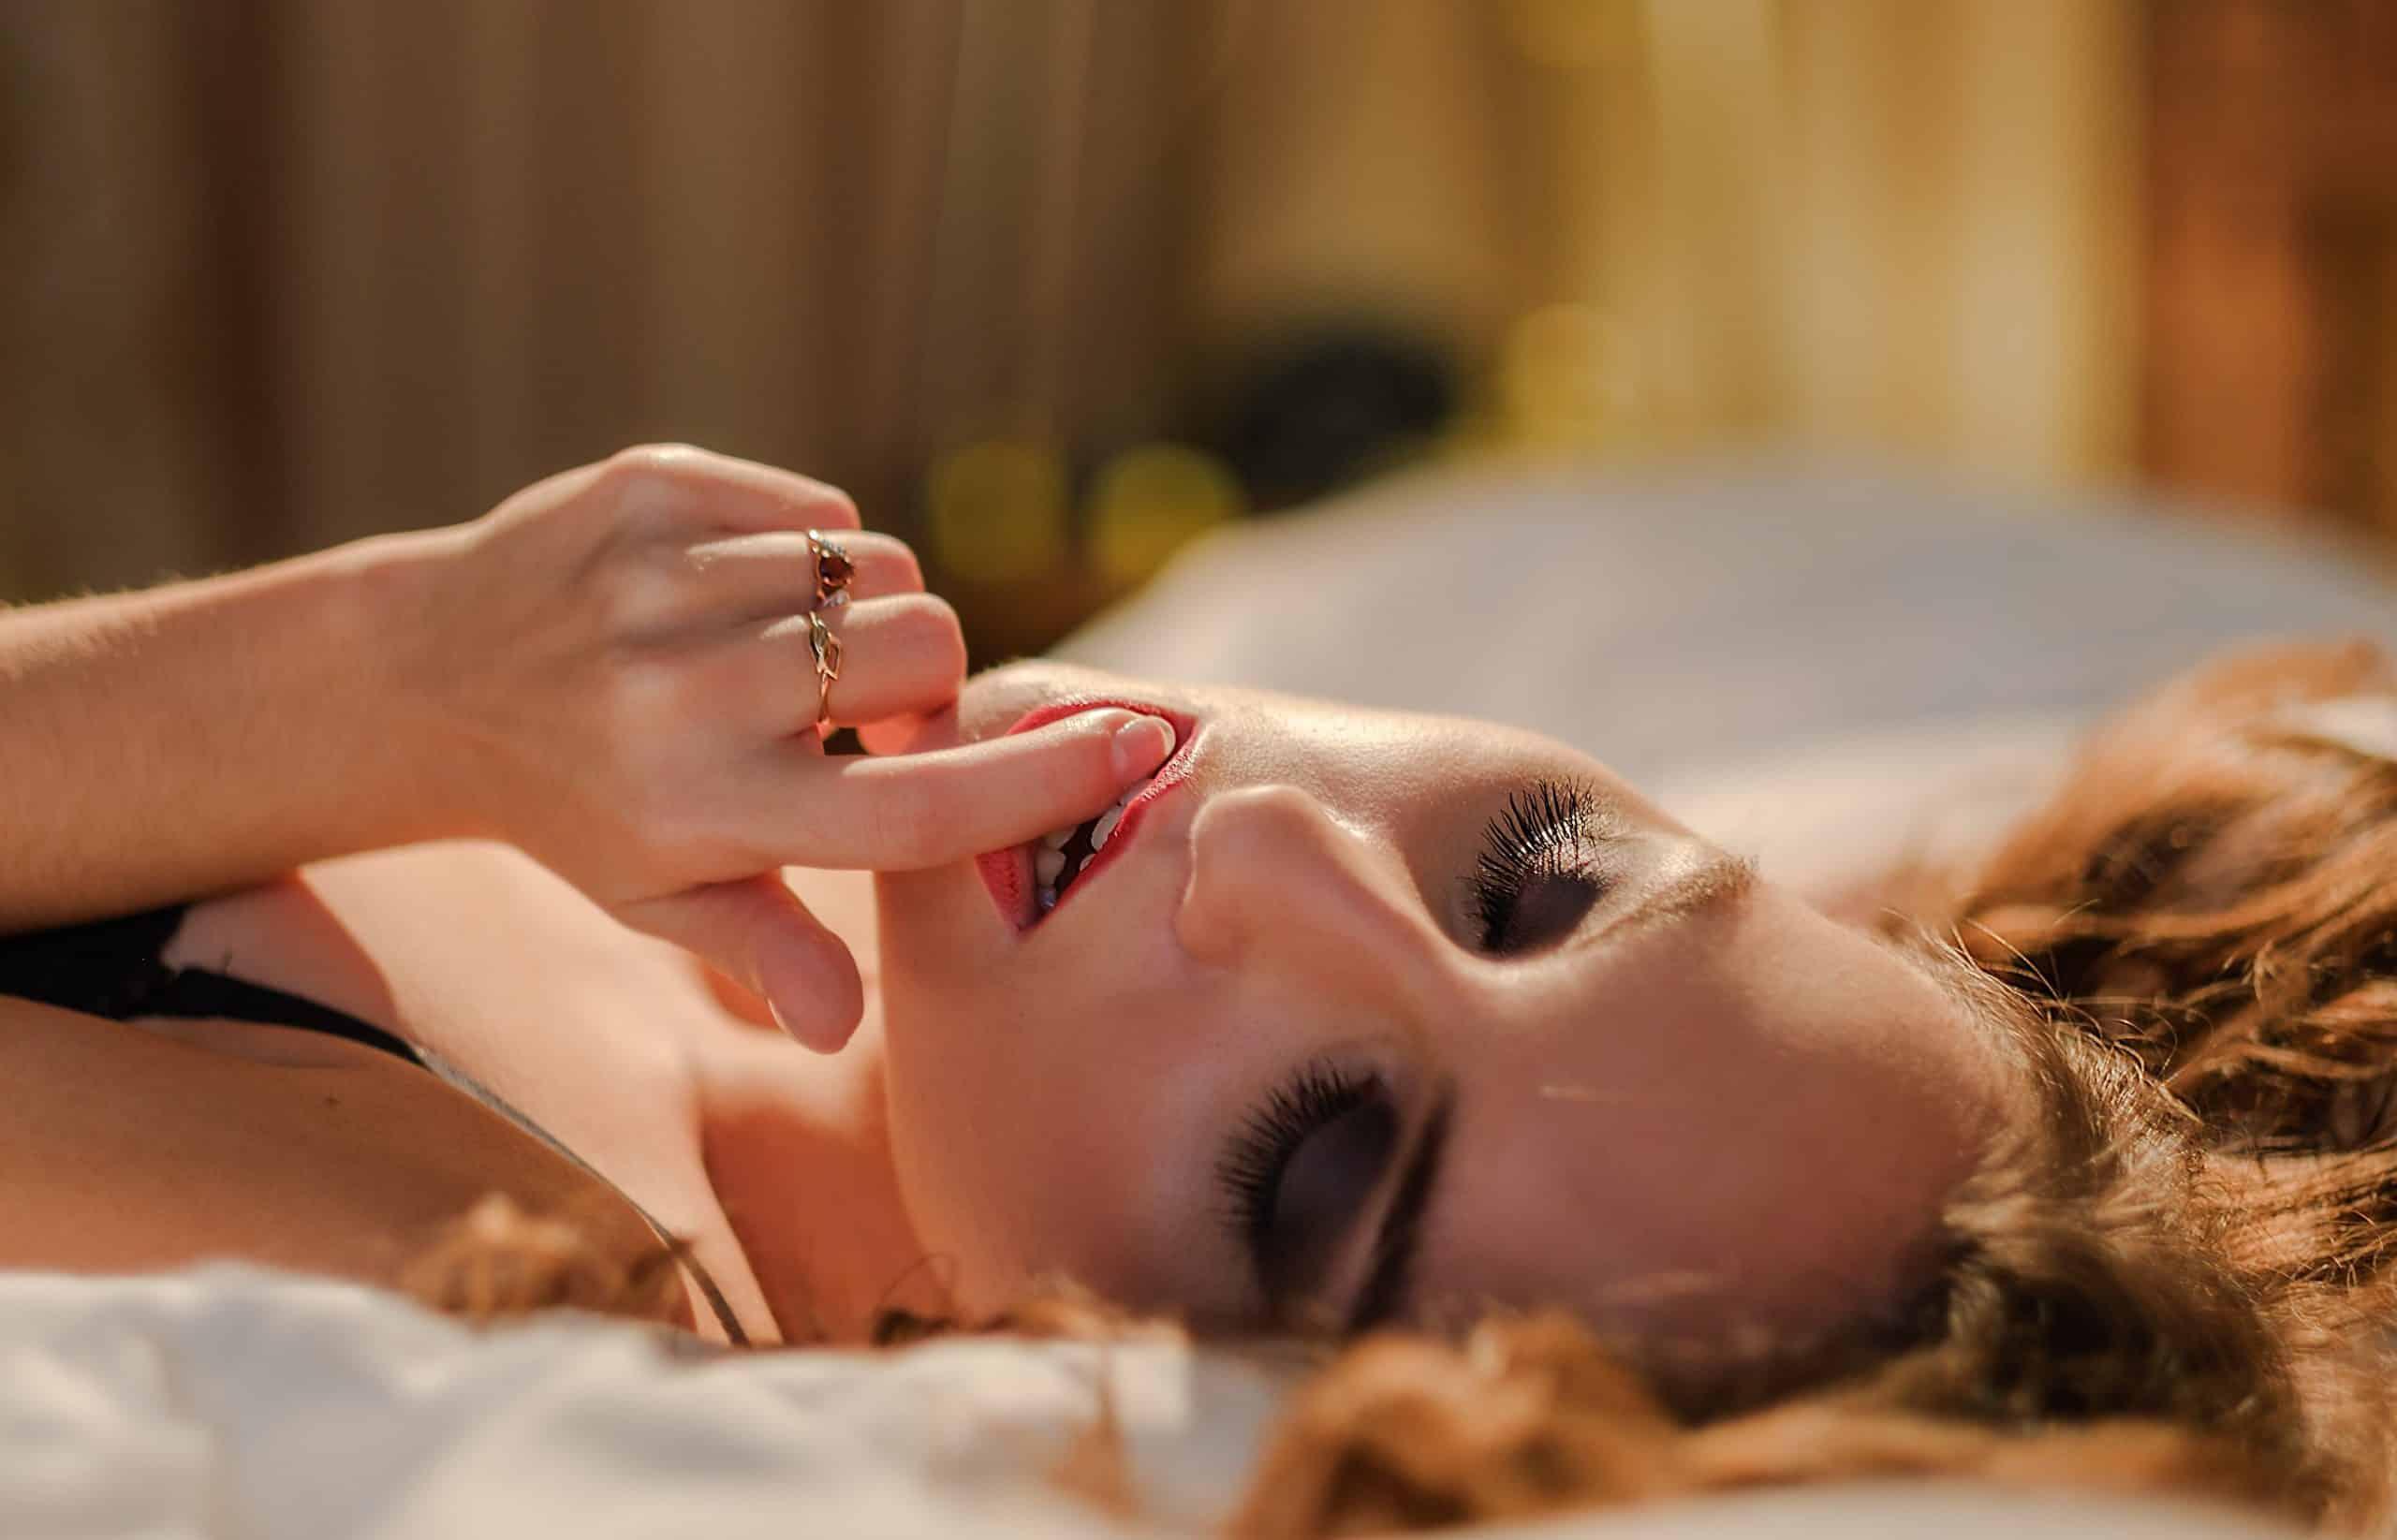 Erotische massage Rotterdam: Escort Marijke